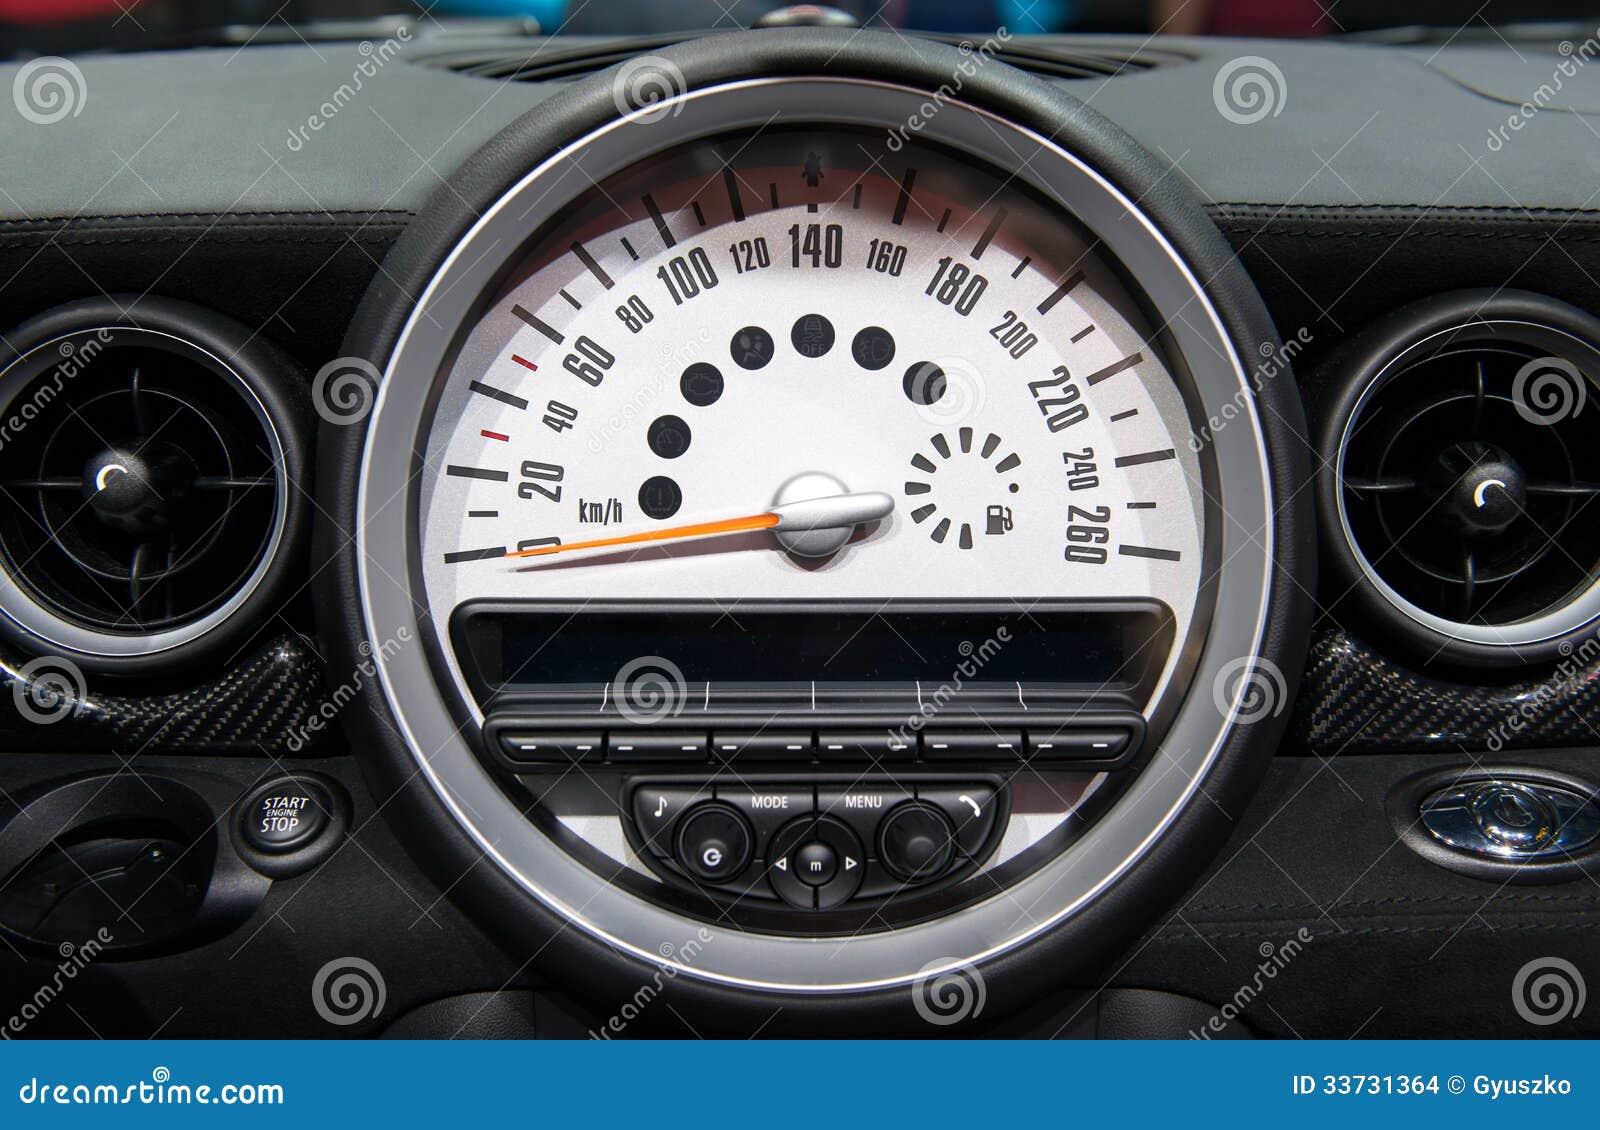 Тахометр автомобиля